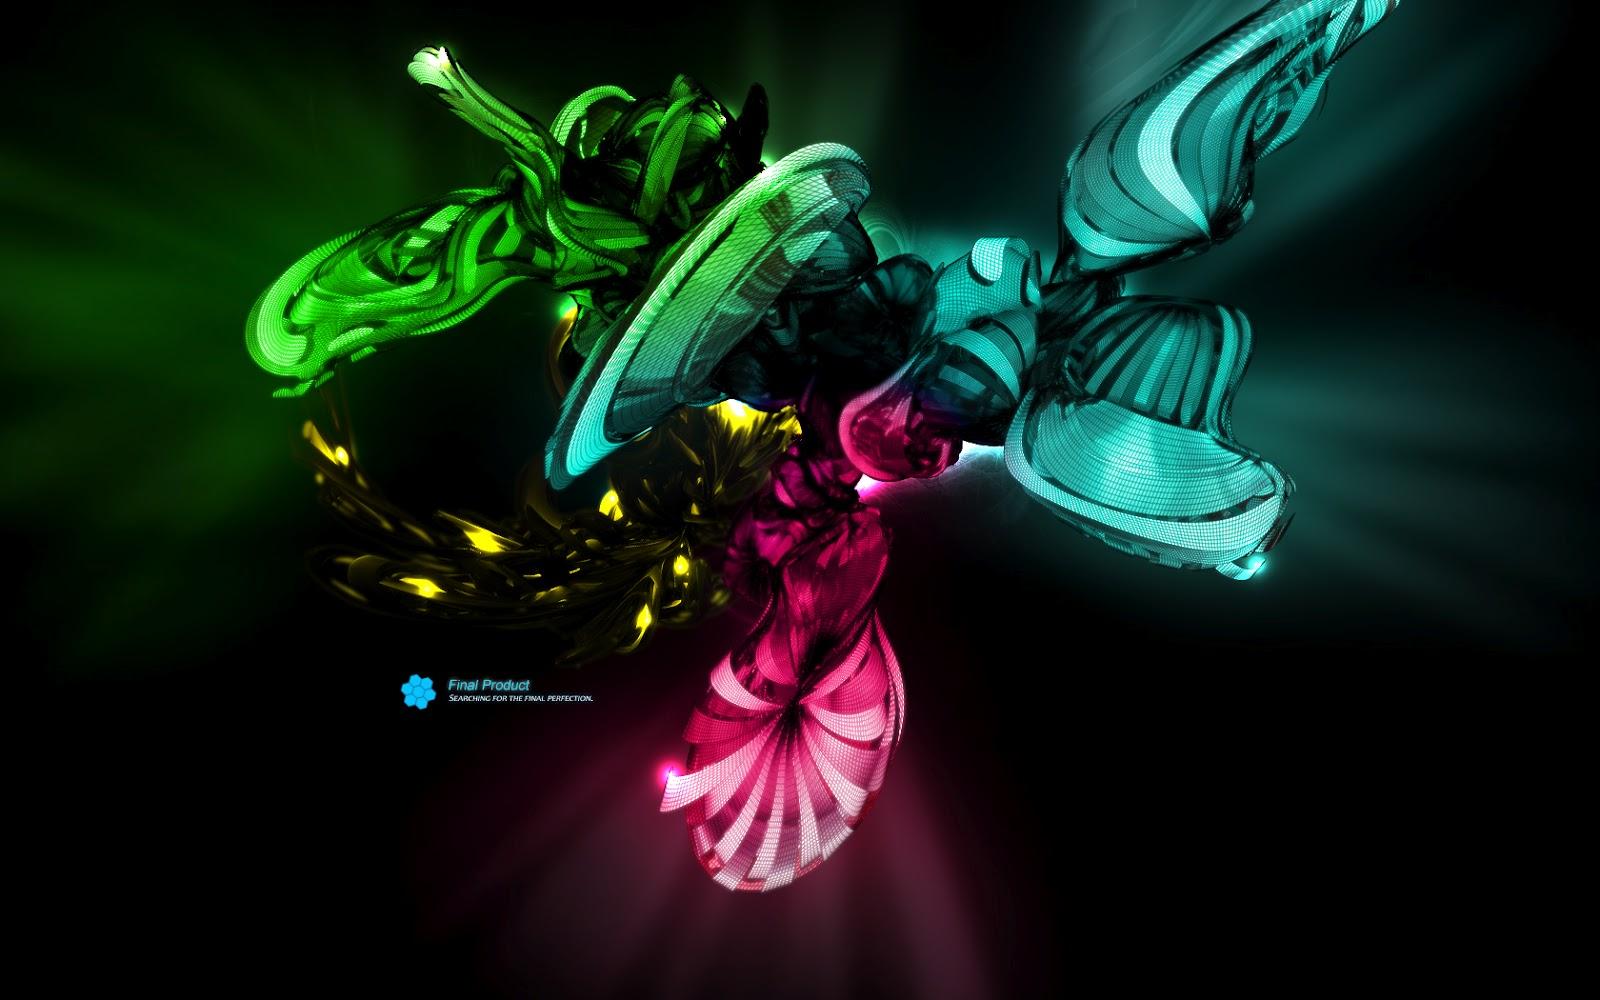 http://4.bp.blogspot.com/-b6VhKYBRtGs/UF4GQv1JfwI/AAAAAAAAA3s/JHCUb4CTW2o/s1600/Fondos-de-pantalla-abstracto-HD-wallpapers.jpg